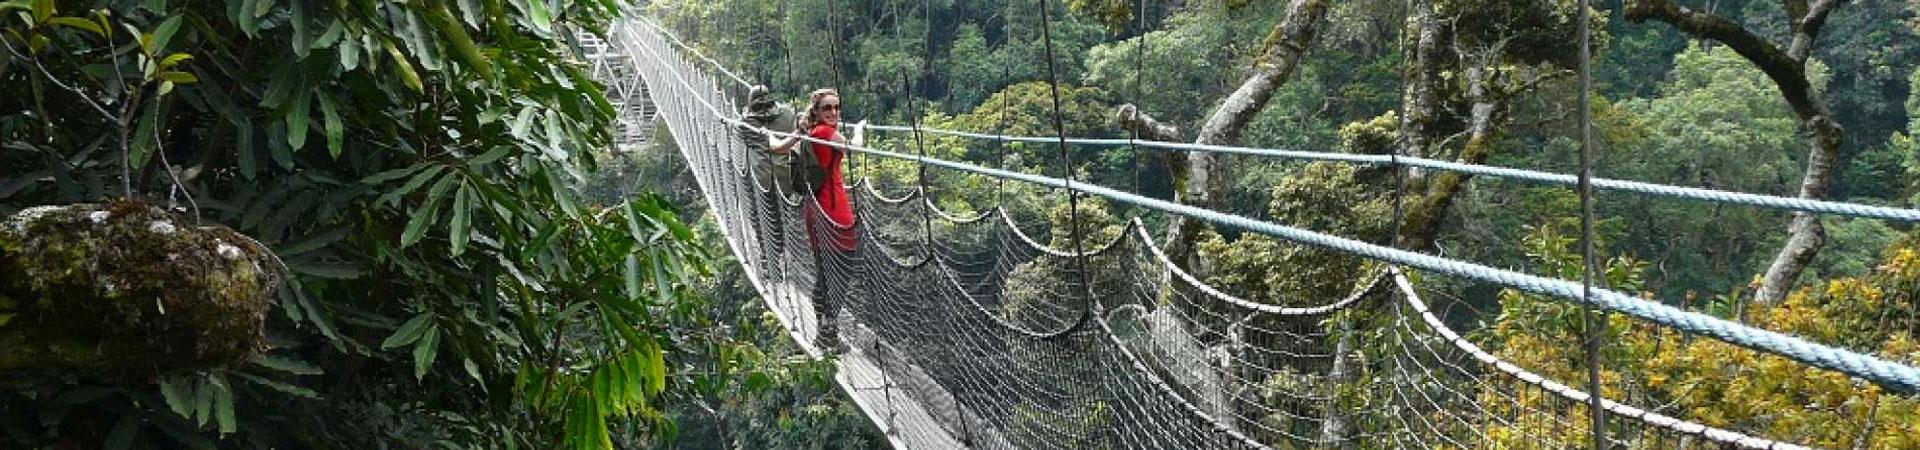 9-Days-Canopy-Walk-Rwanda-Nyungwe-National-Park